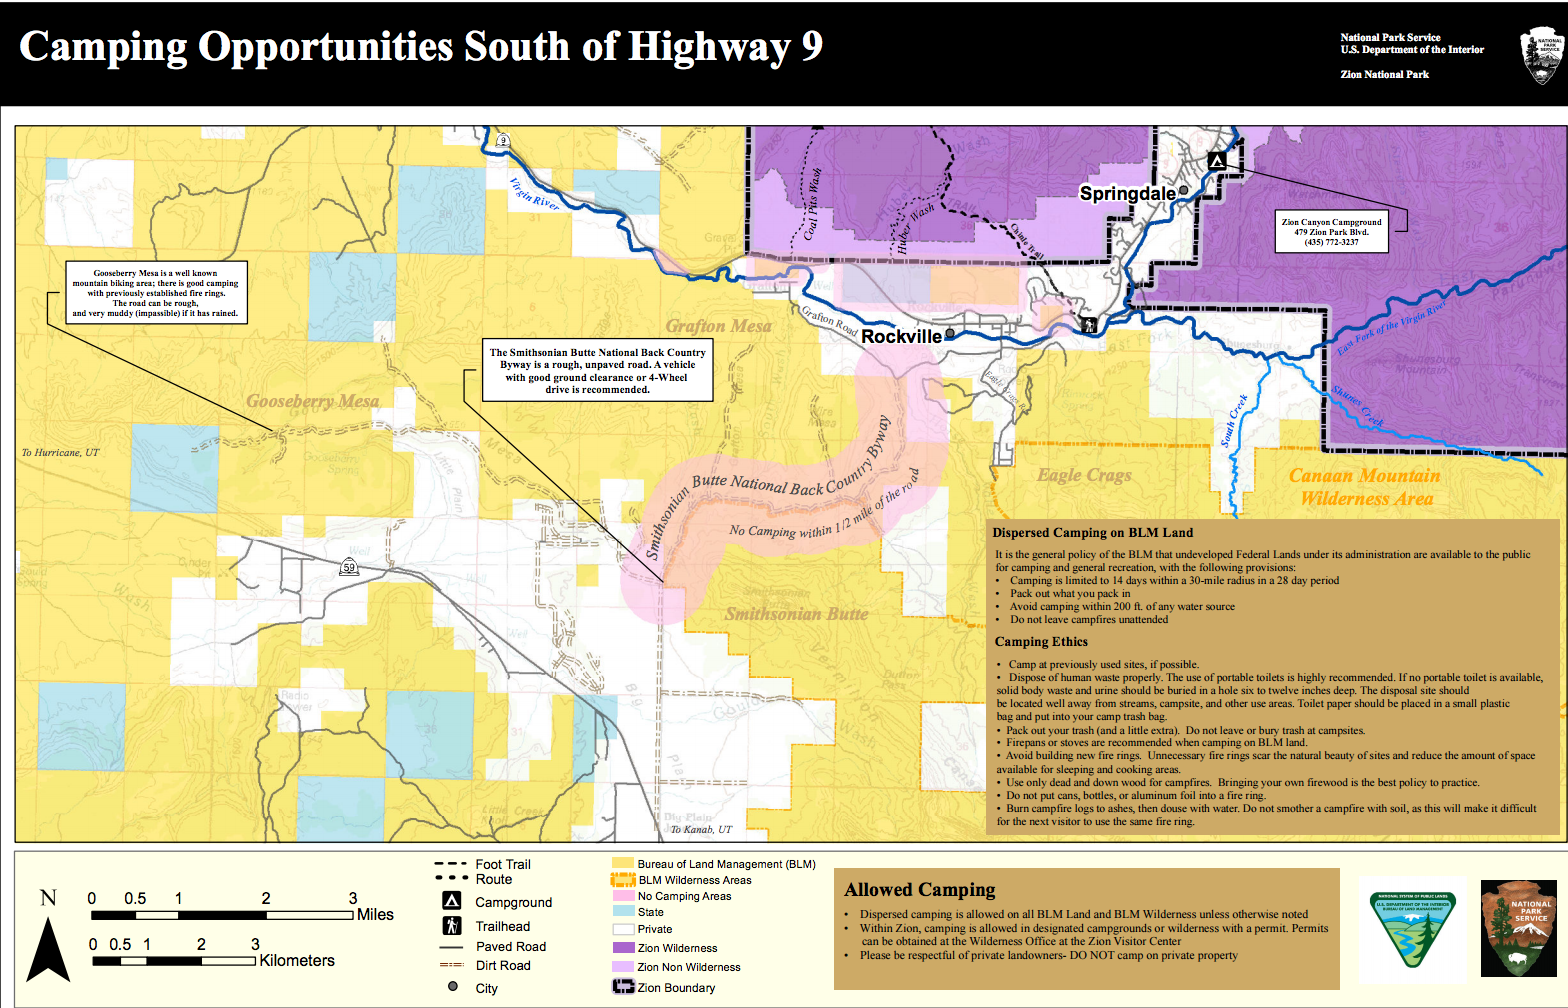 Sample BLM Map near Zion National Park, Utah